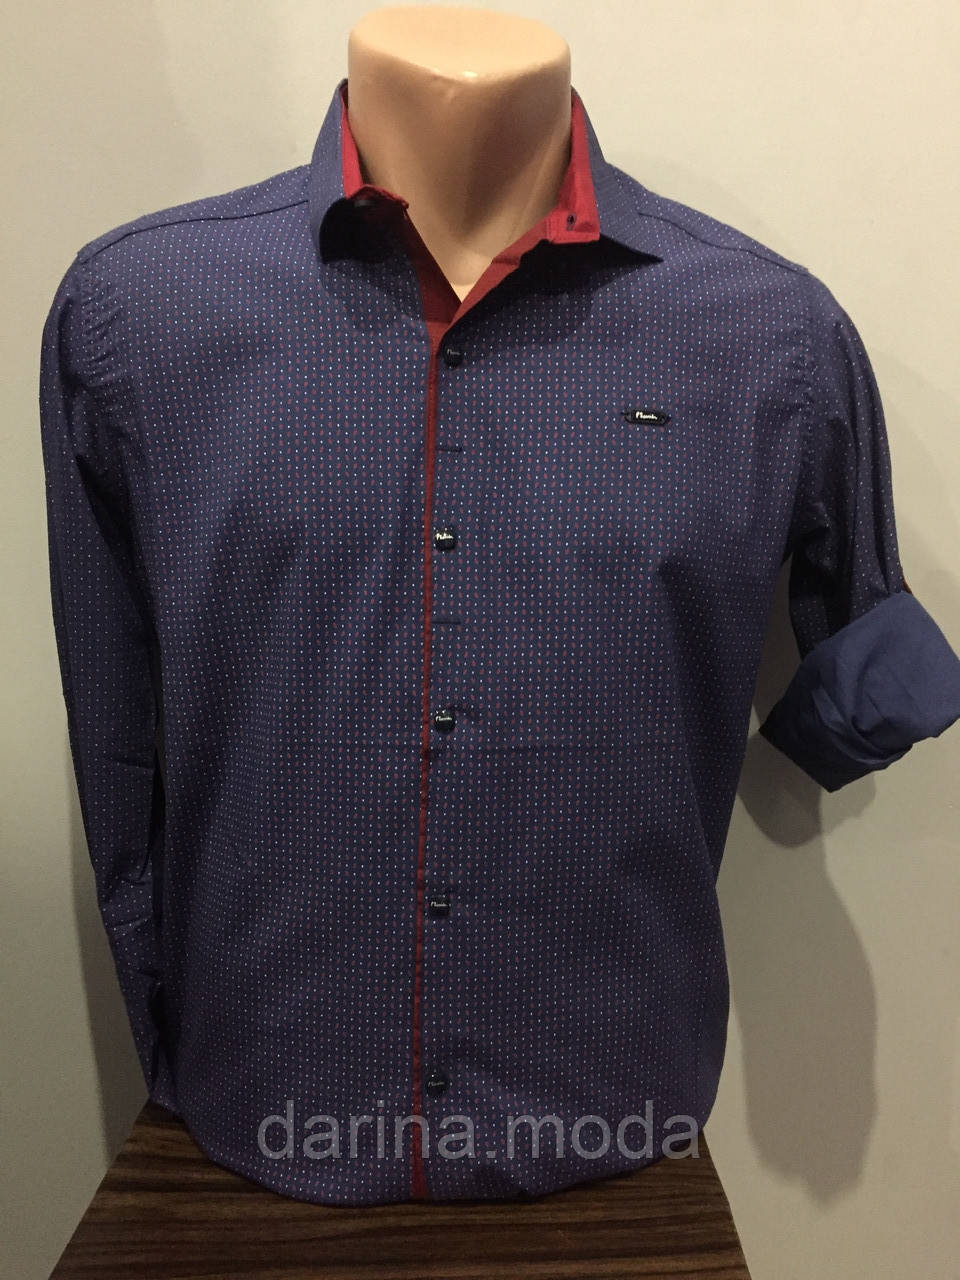 Мужская рубашка на кнопках S-2XL